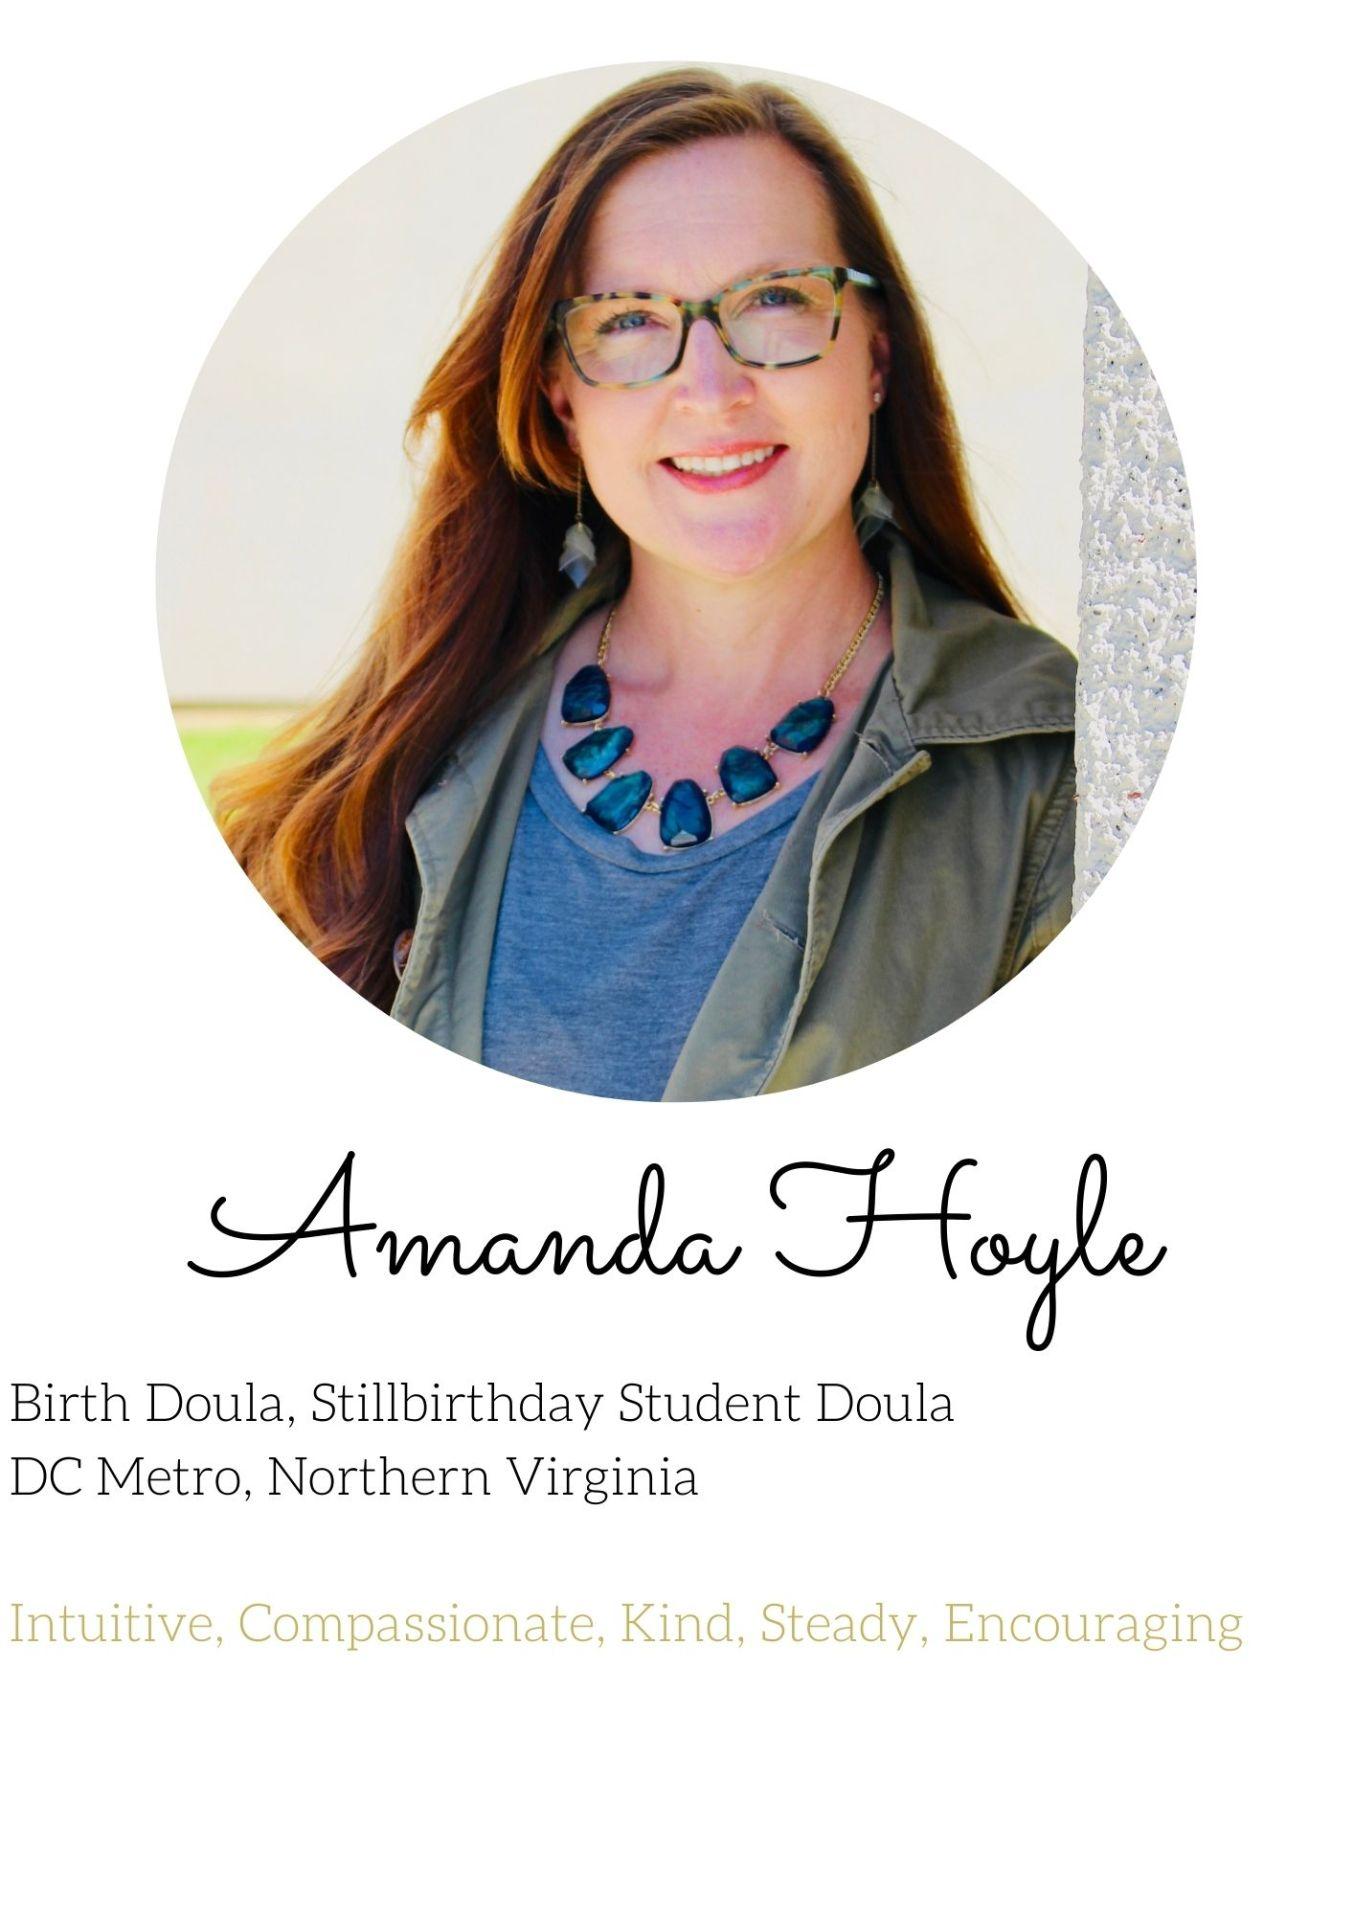 Amanda hoyle military doula experienced dc northern virginia